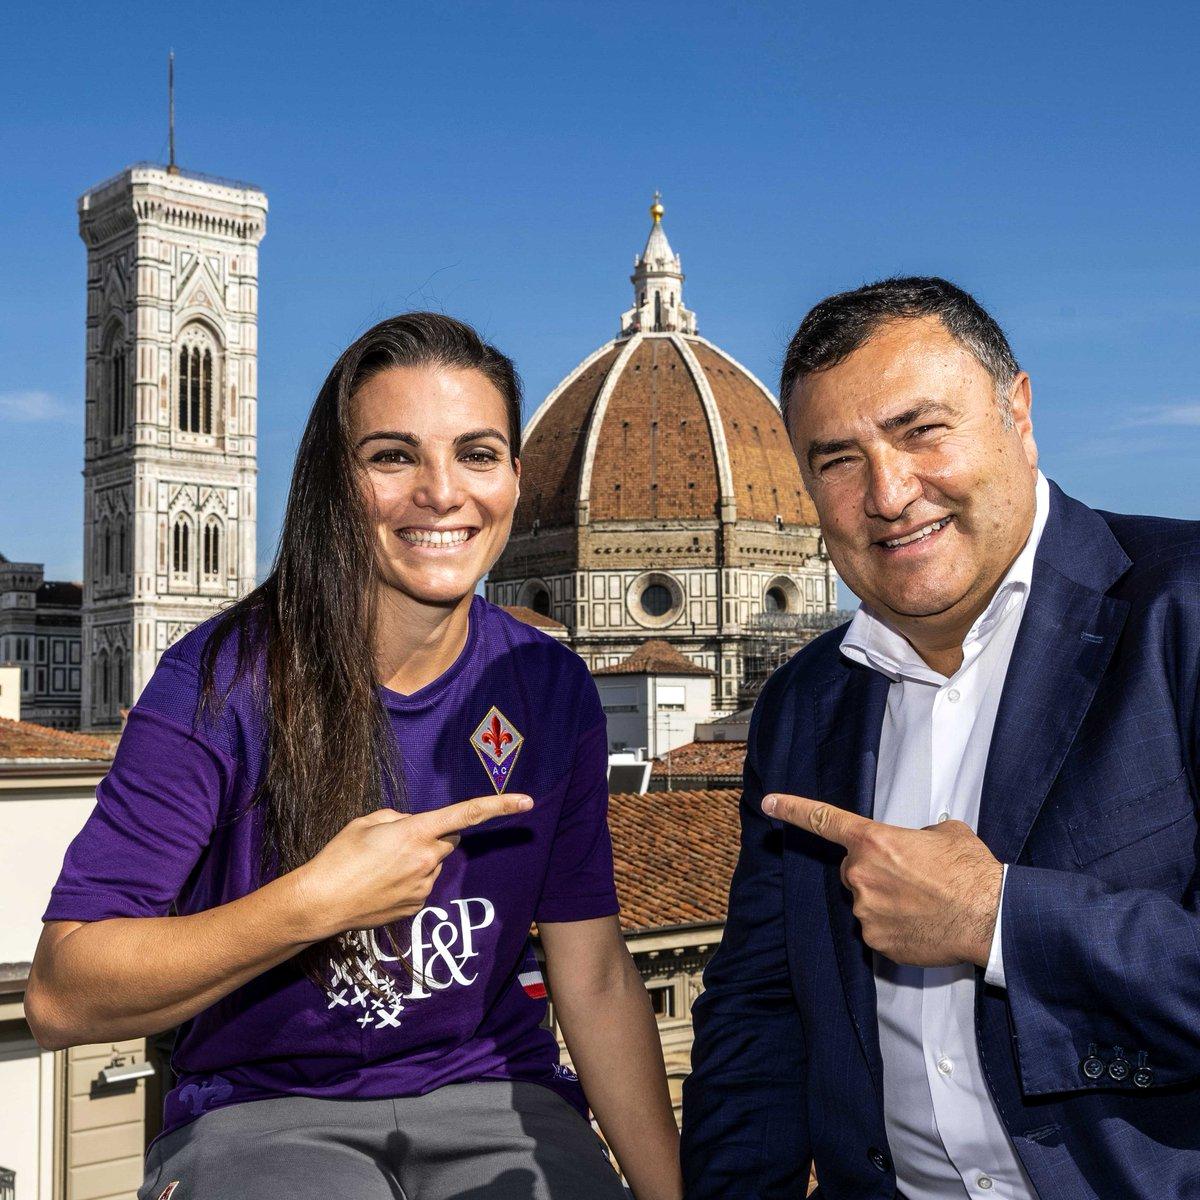 👉⚜️👈  #ForzaViola 💜 #Firenze #Guagni #Barone https://t.co/SdV7pE8d6y